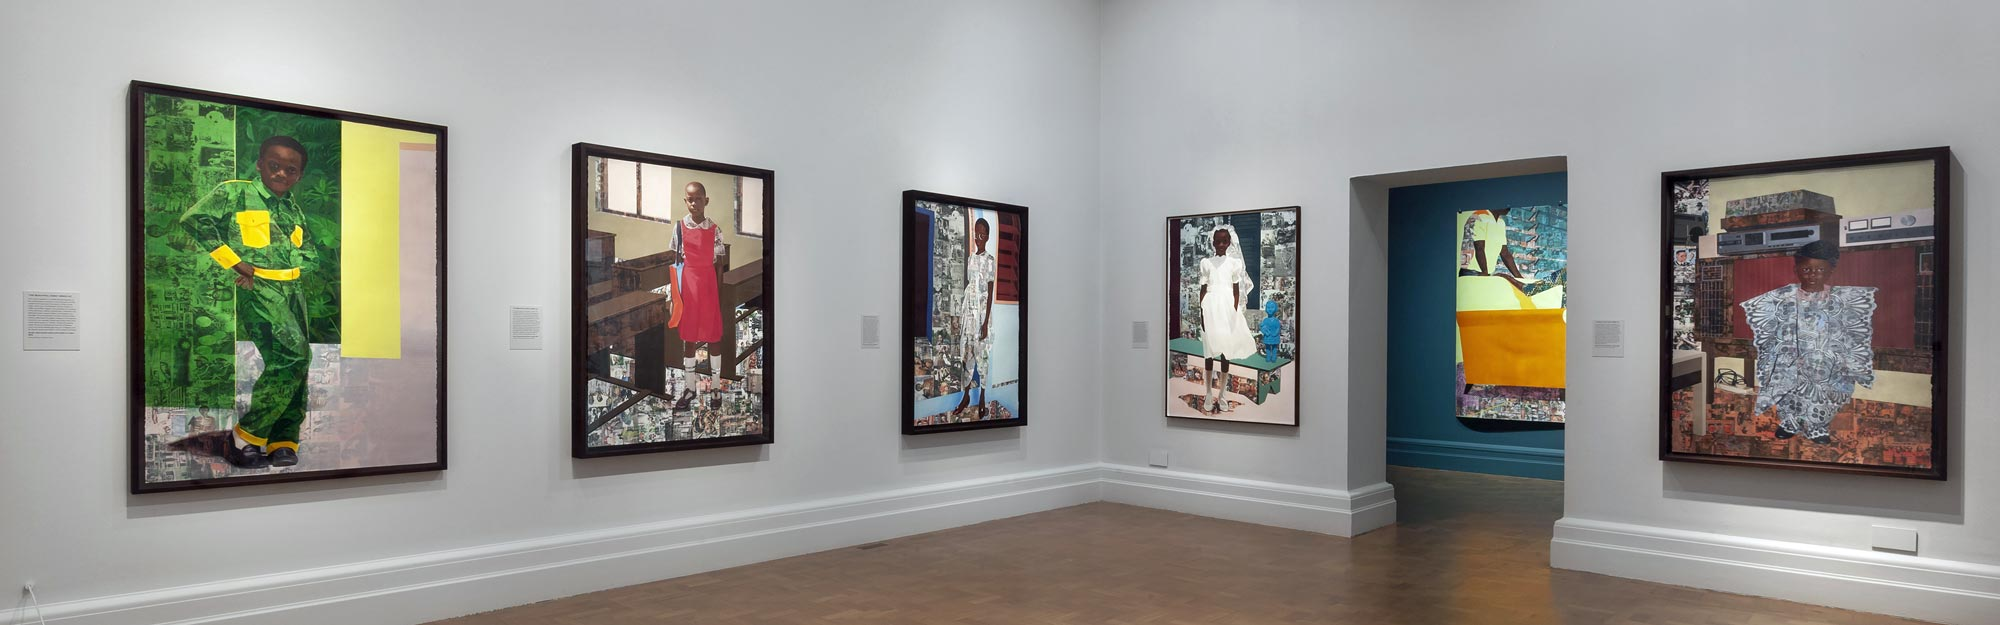 "Njideka Akunyili Crosby: ""The Beautyful Ones"" courtesy National Portrait Gallery"